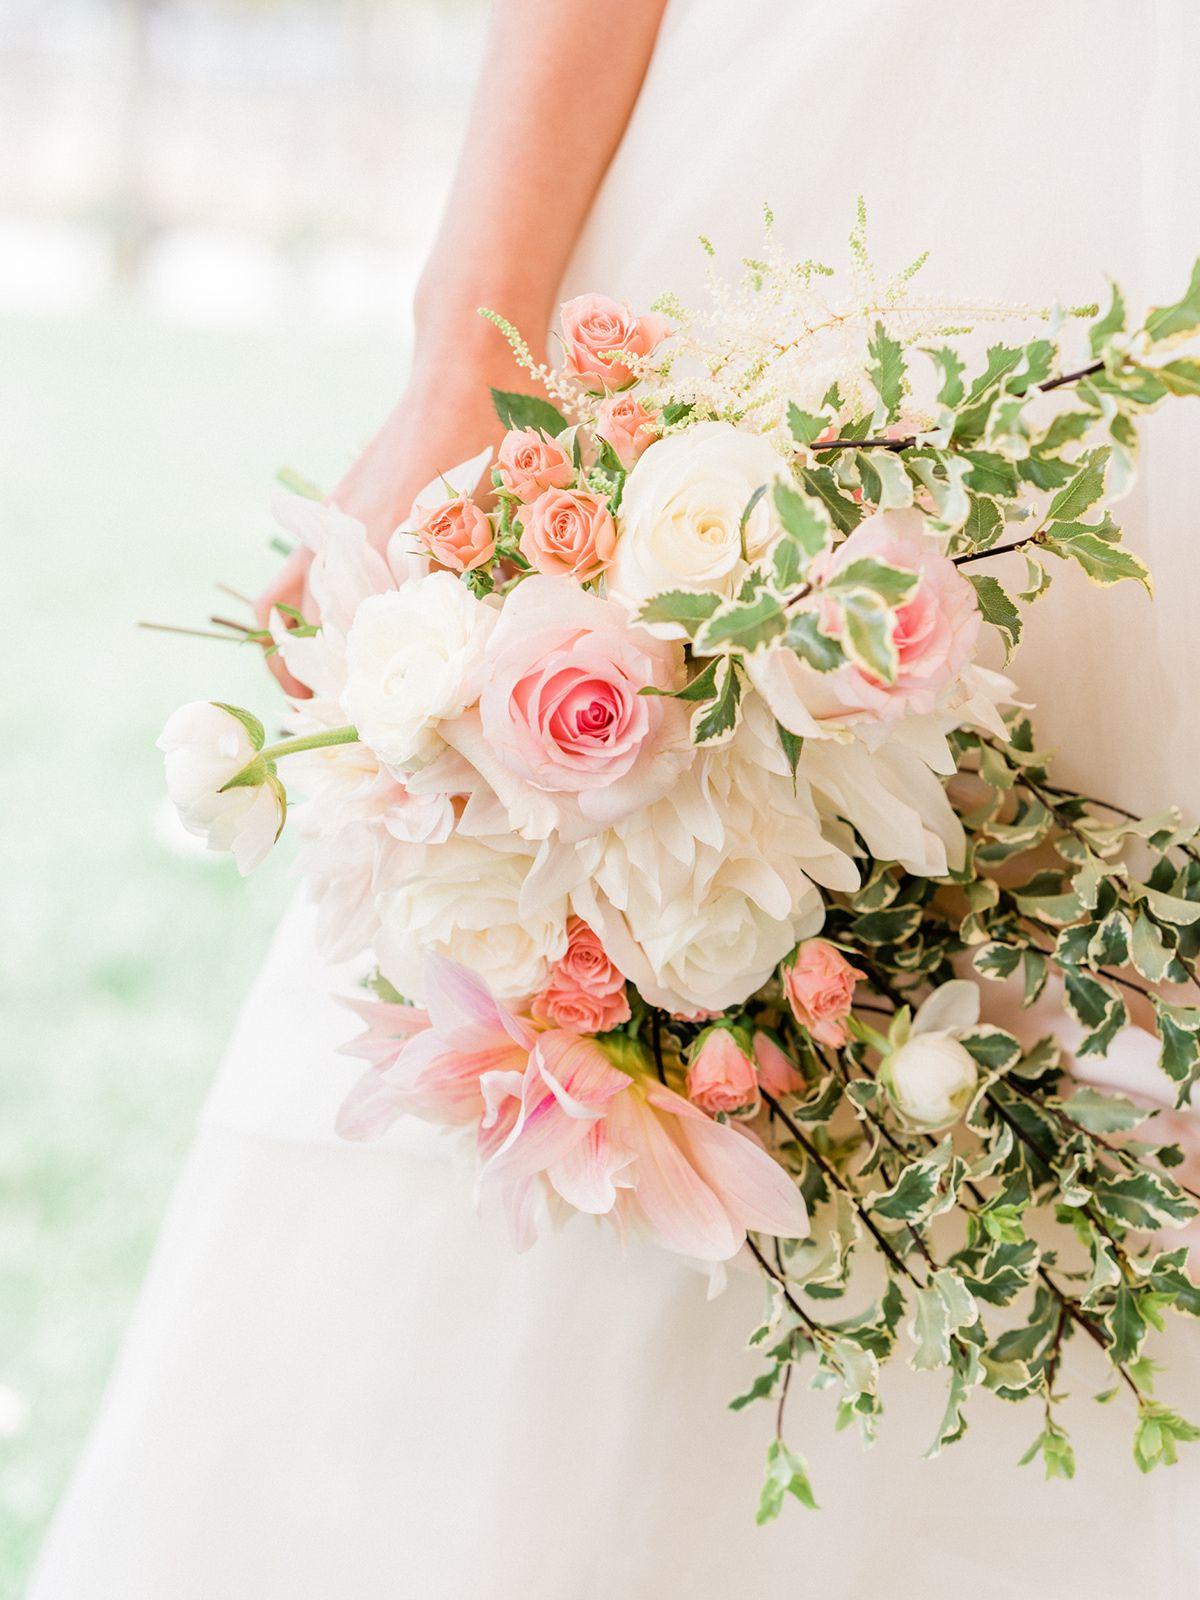 Bridal Bouquet Temecula Ca Bride Holding Rustic Romantic And Organic Blush And White Bridal Bouq Spring Wedding Bouquets White Bridal Bouquet Floral Wedding